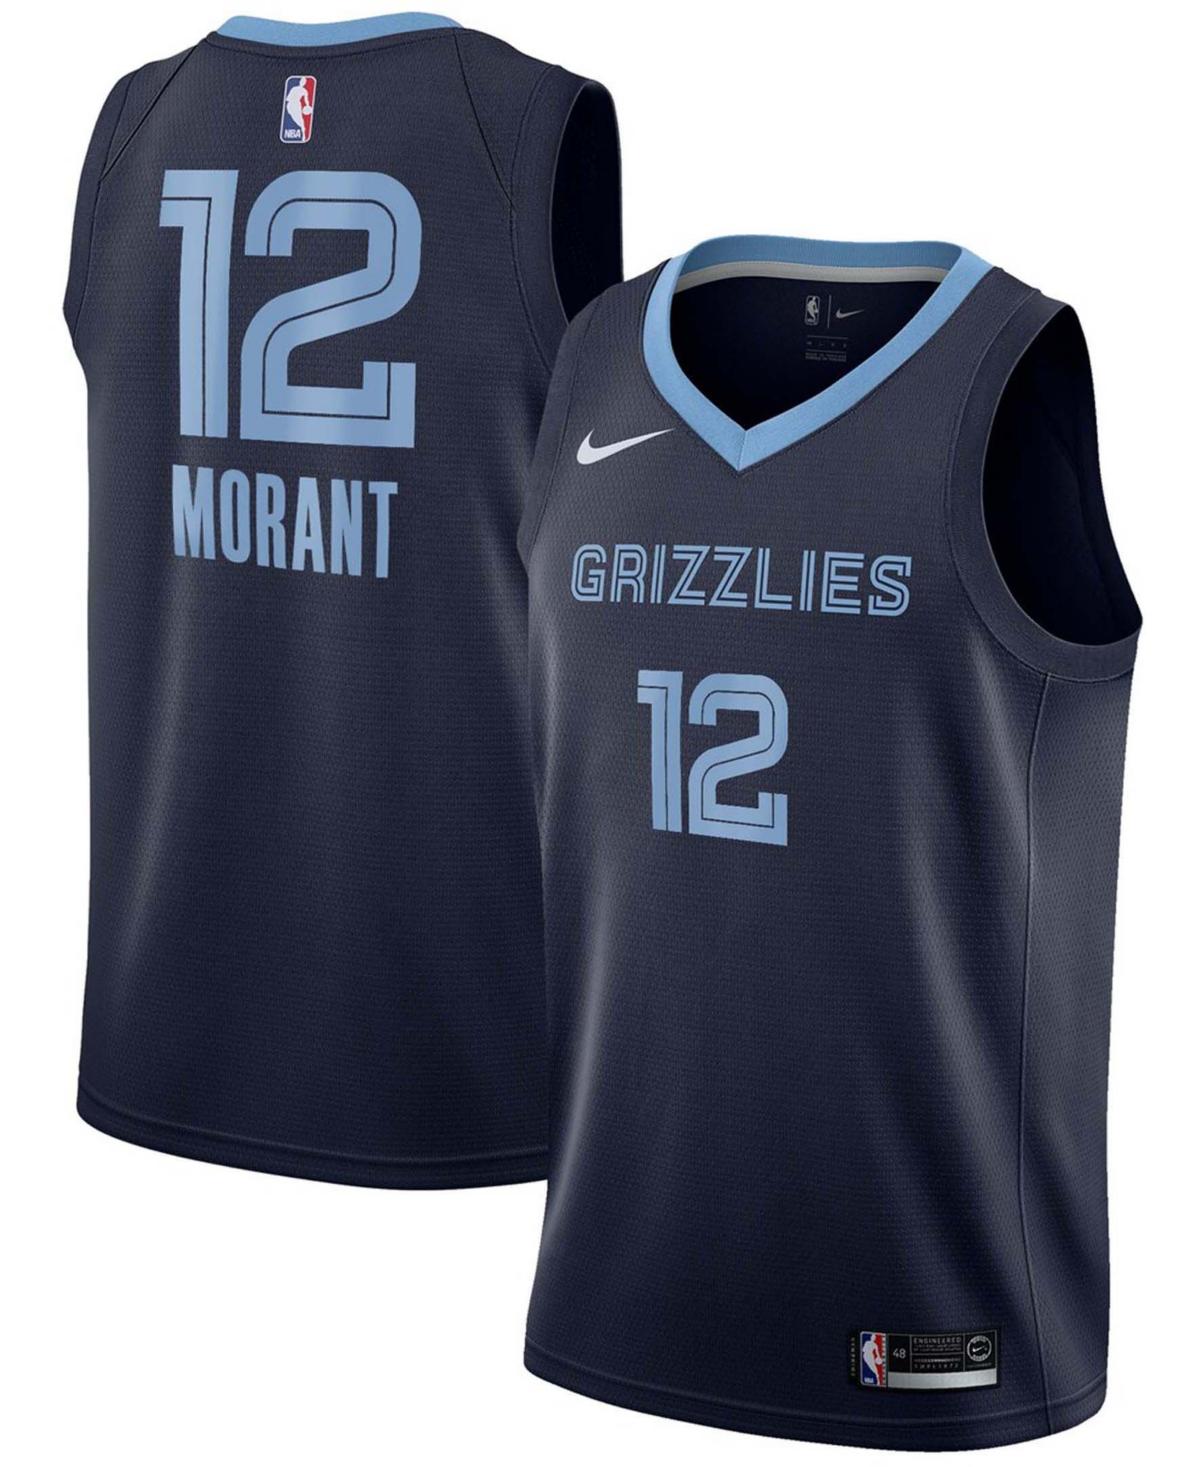 Men's Ja Morant Navy Memphis Grizzlies 2019 Nba Draft First Round Pick Swingman Jersey - Icon Edition